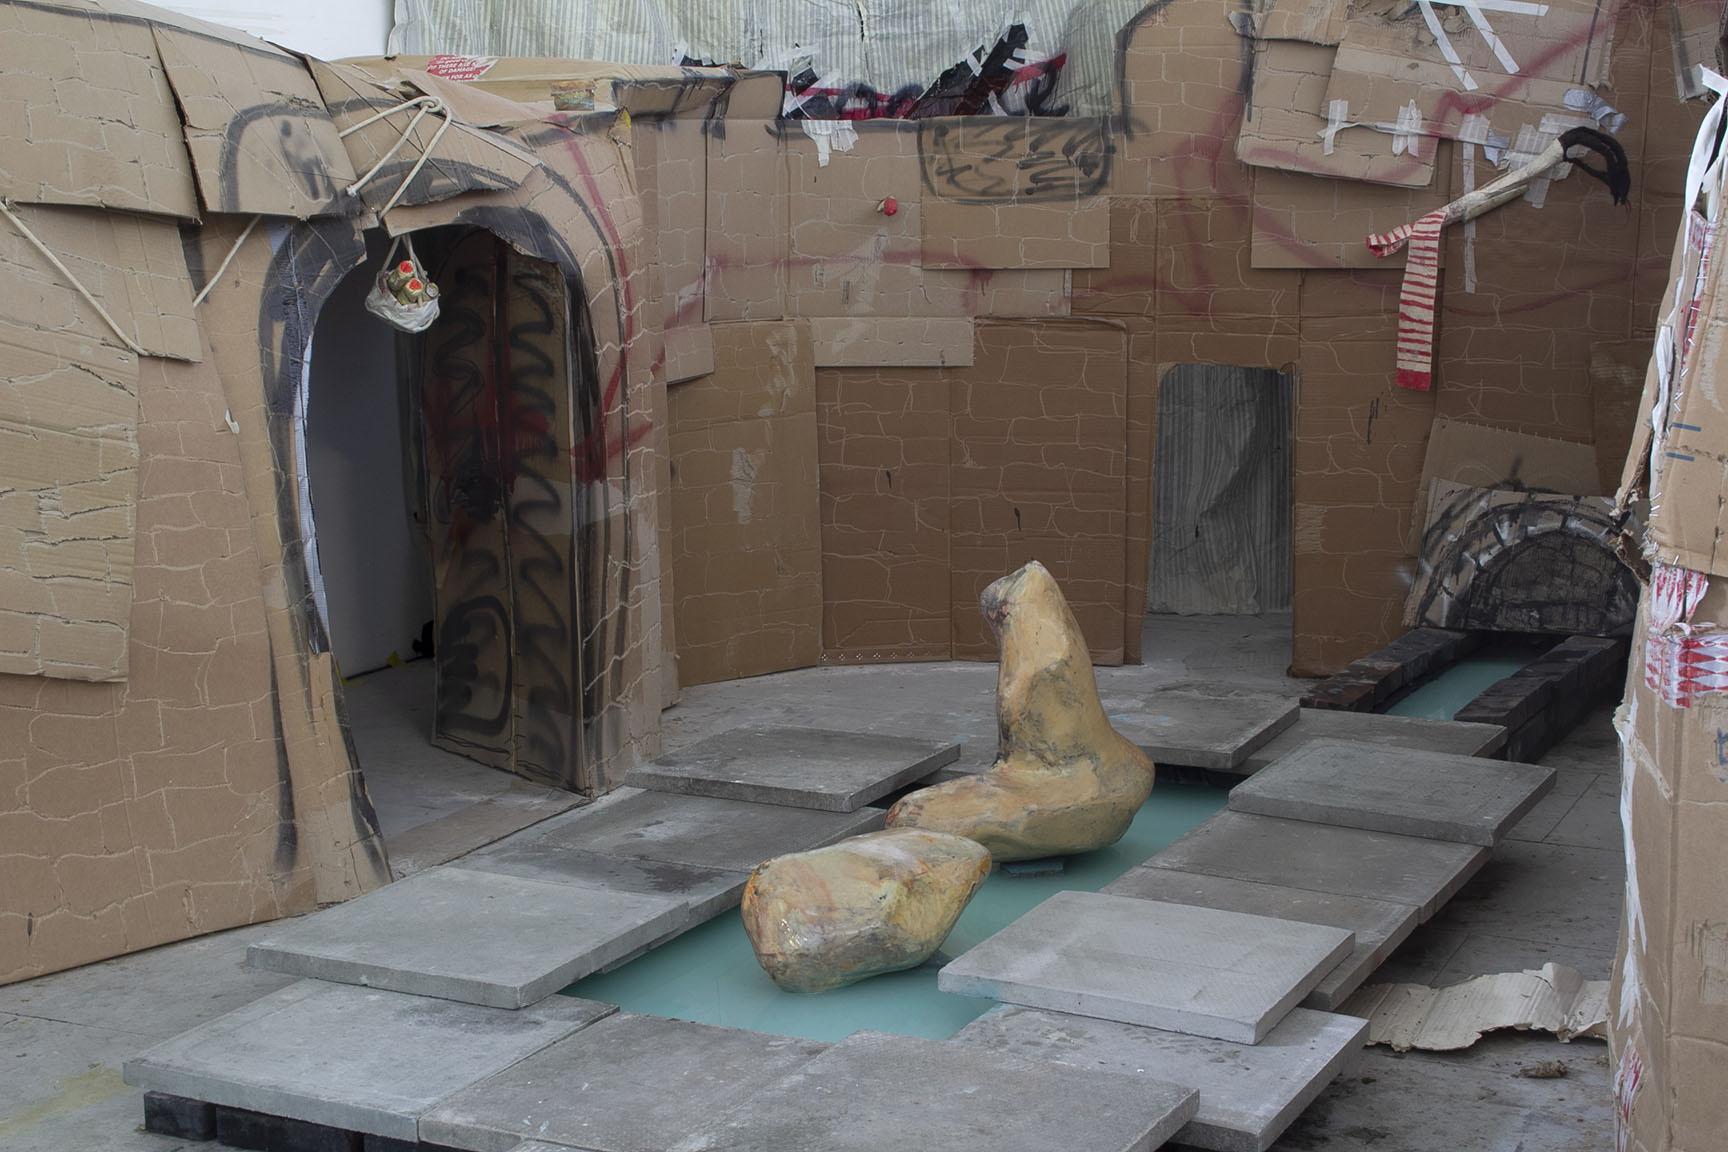 Bechamel from mars 2019 resin, pigments, water, bricks, bubbles.  Installation views in collaboration with Henrique Lázaro Palmeirim, Deptford Studios, Goldsmiths London UK